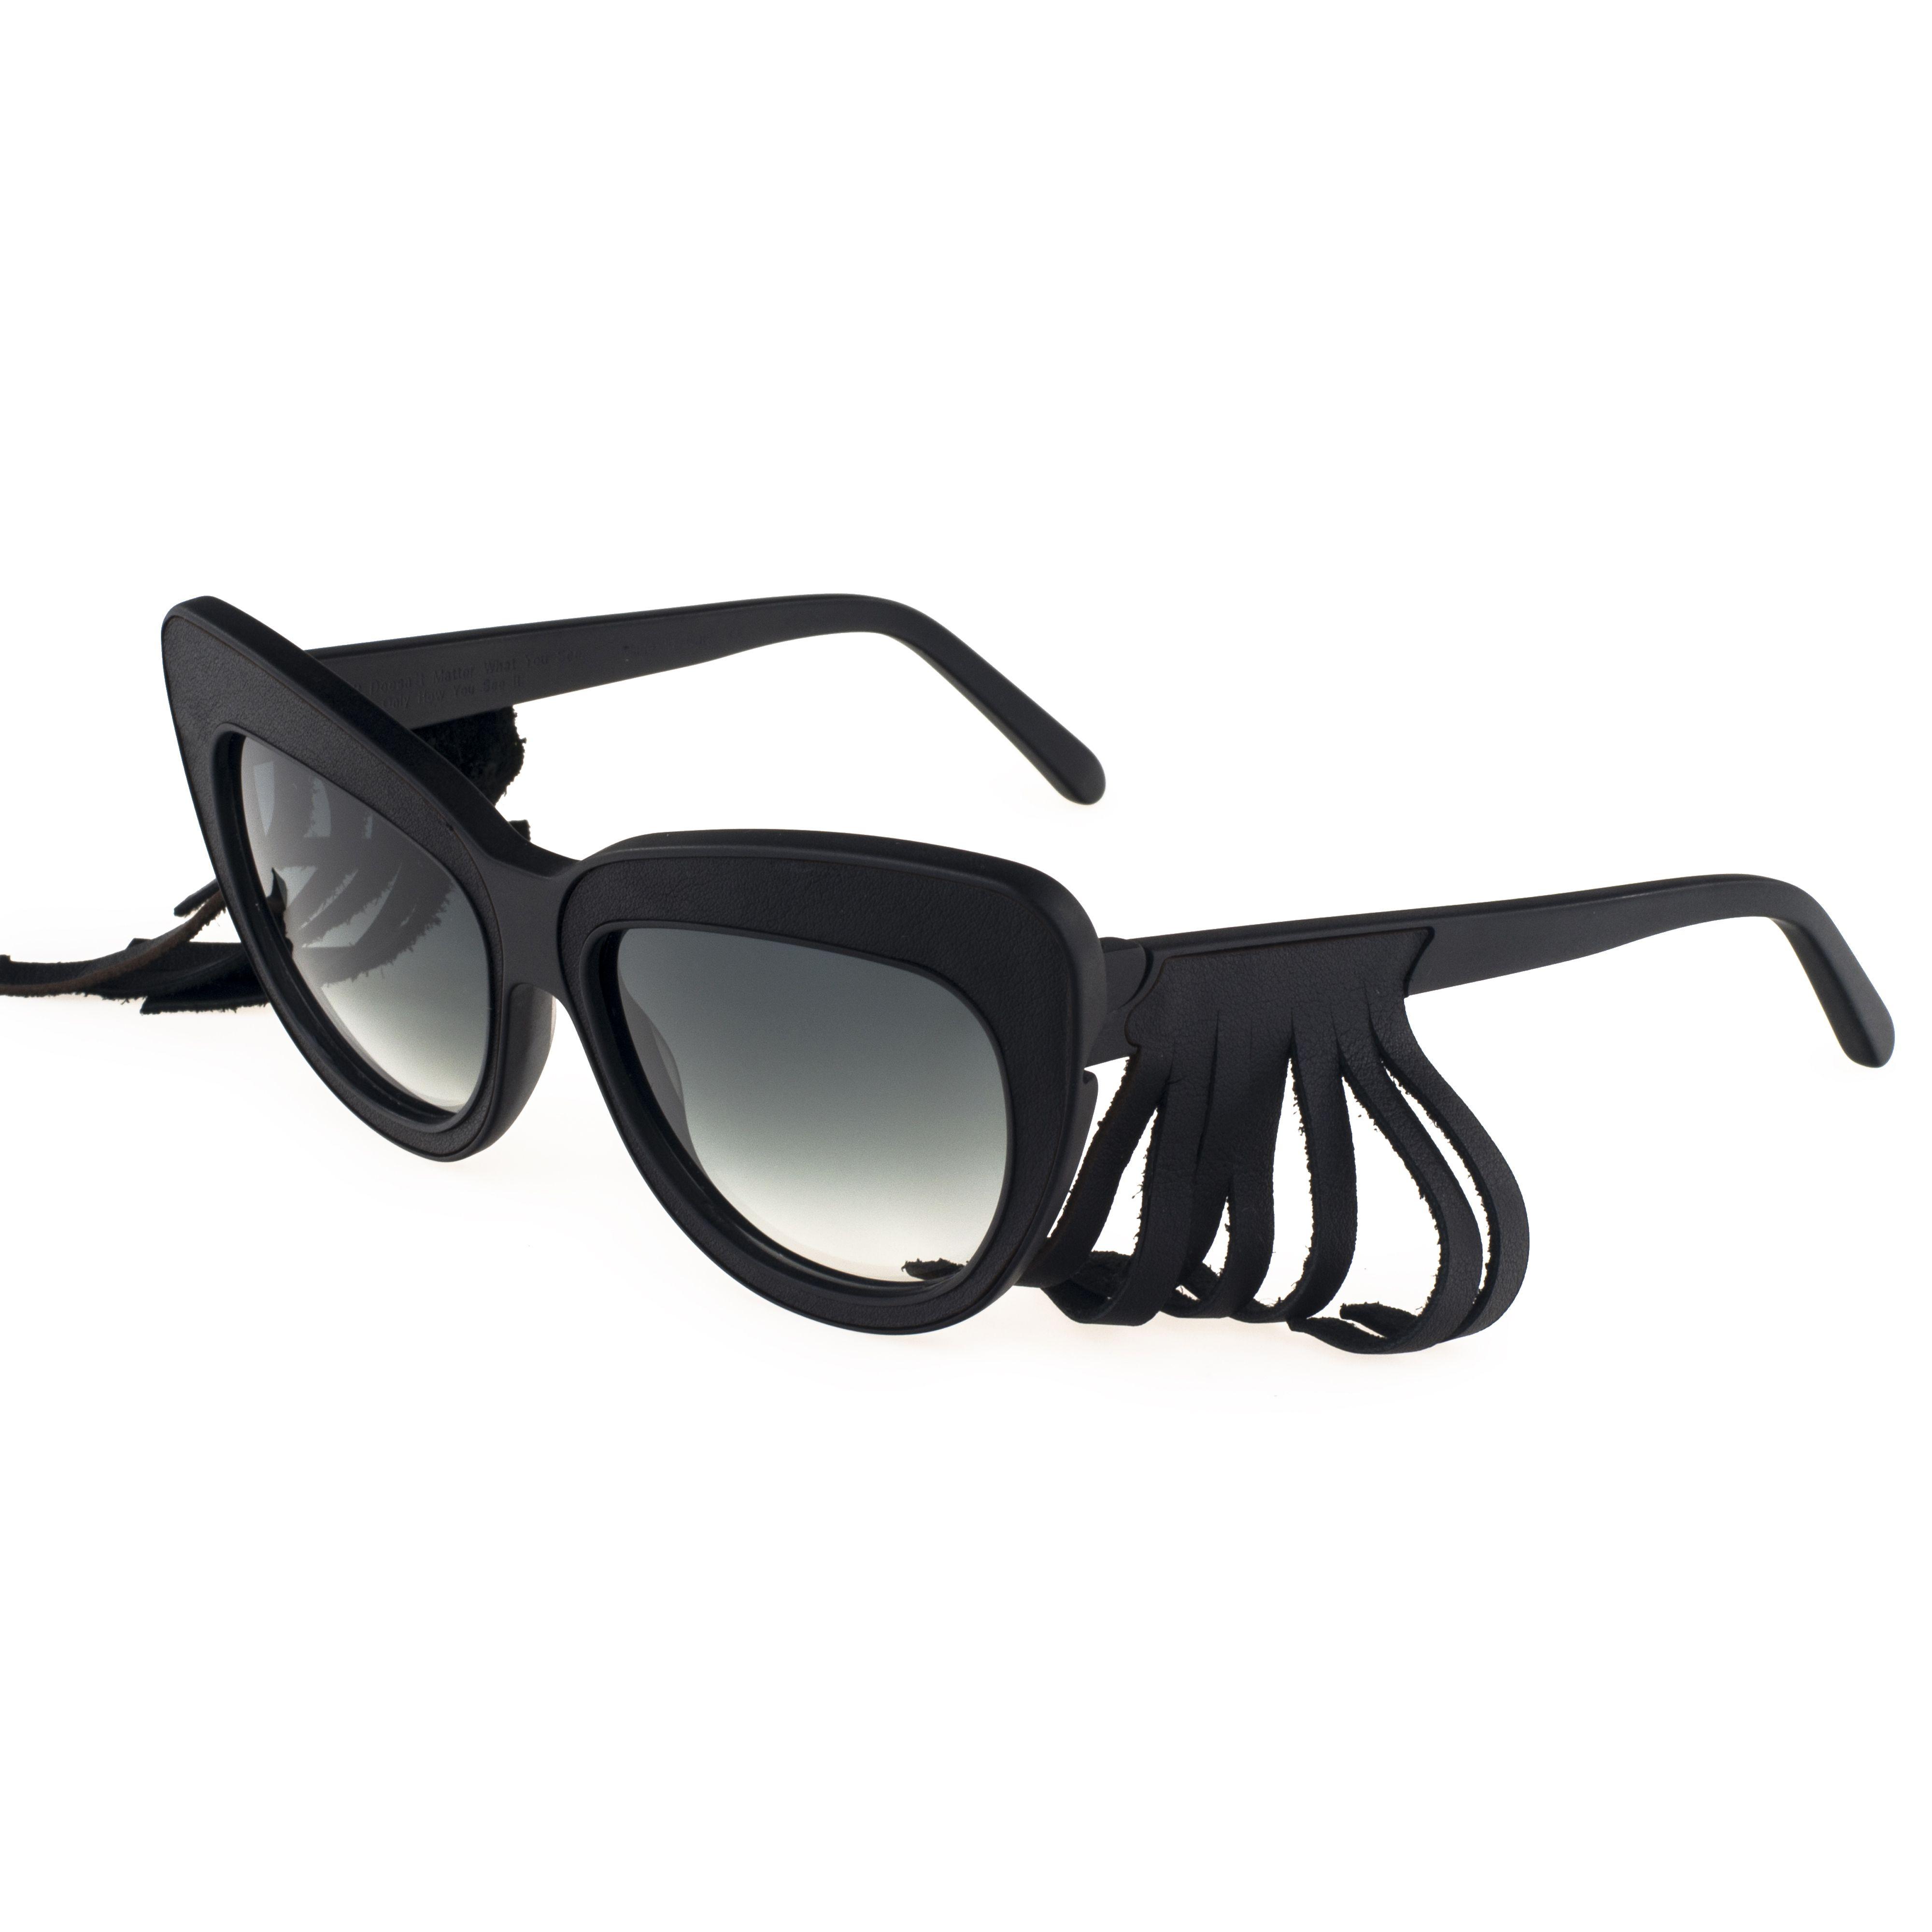 f222ace0e14 Glassing Sunglasses Italy Design Glasses. Glassing Eyewear Latest  Collection Eyewear Online